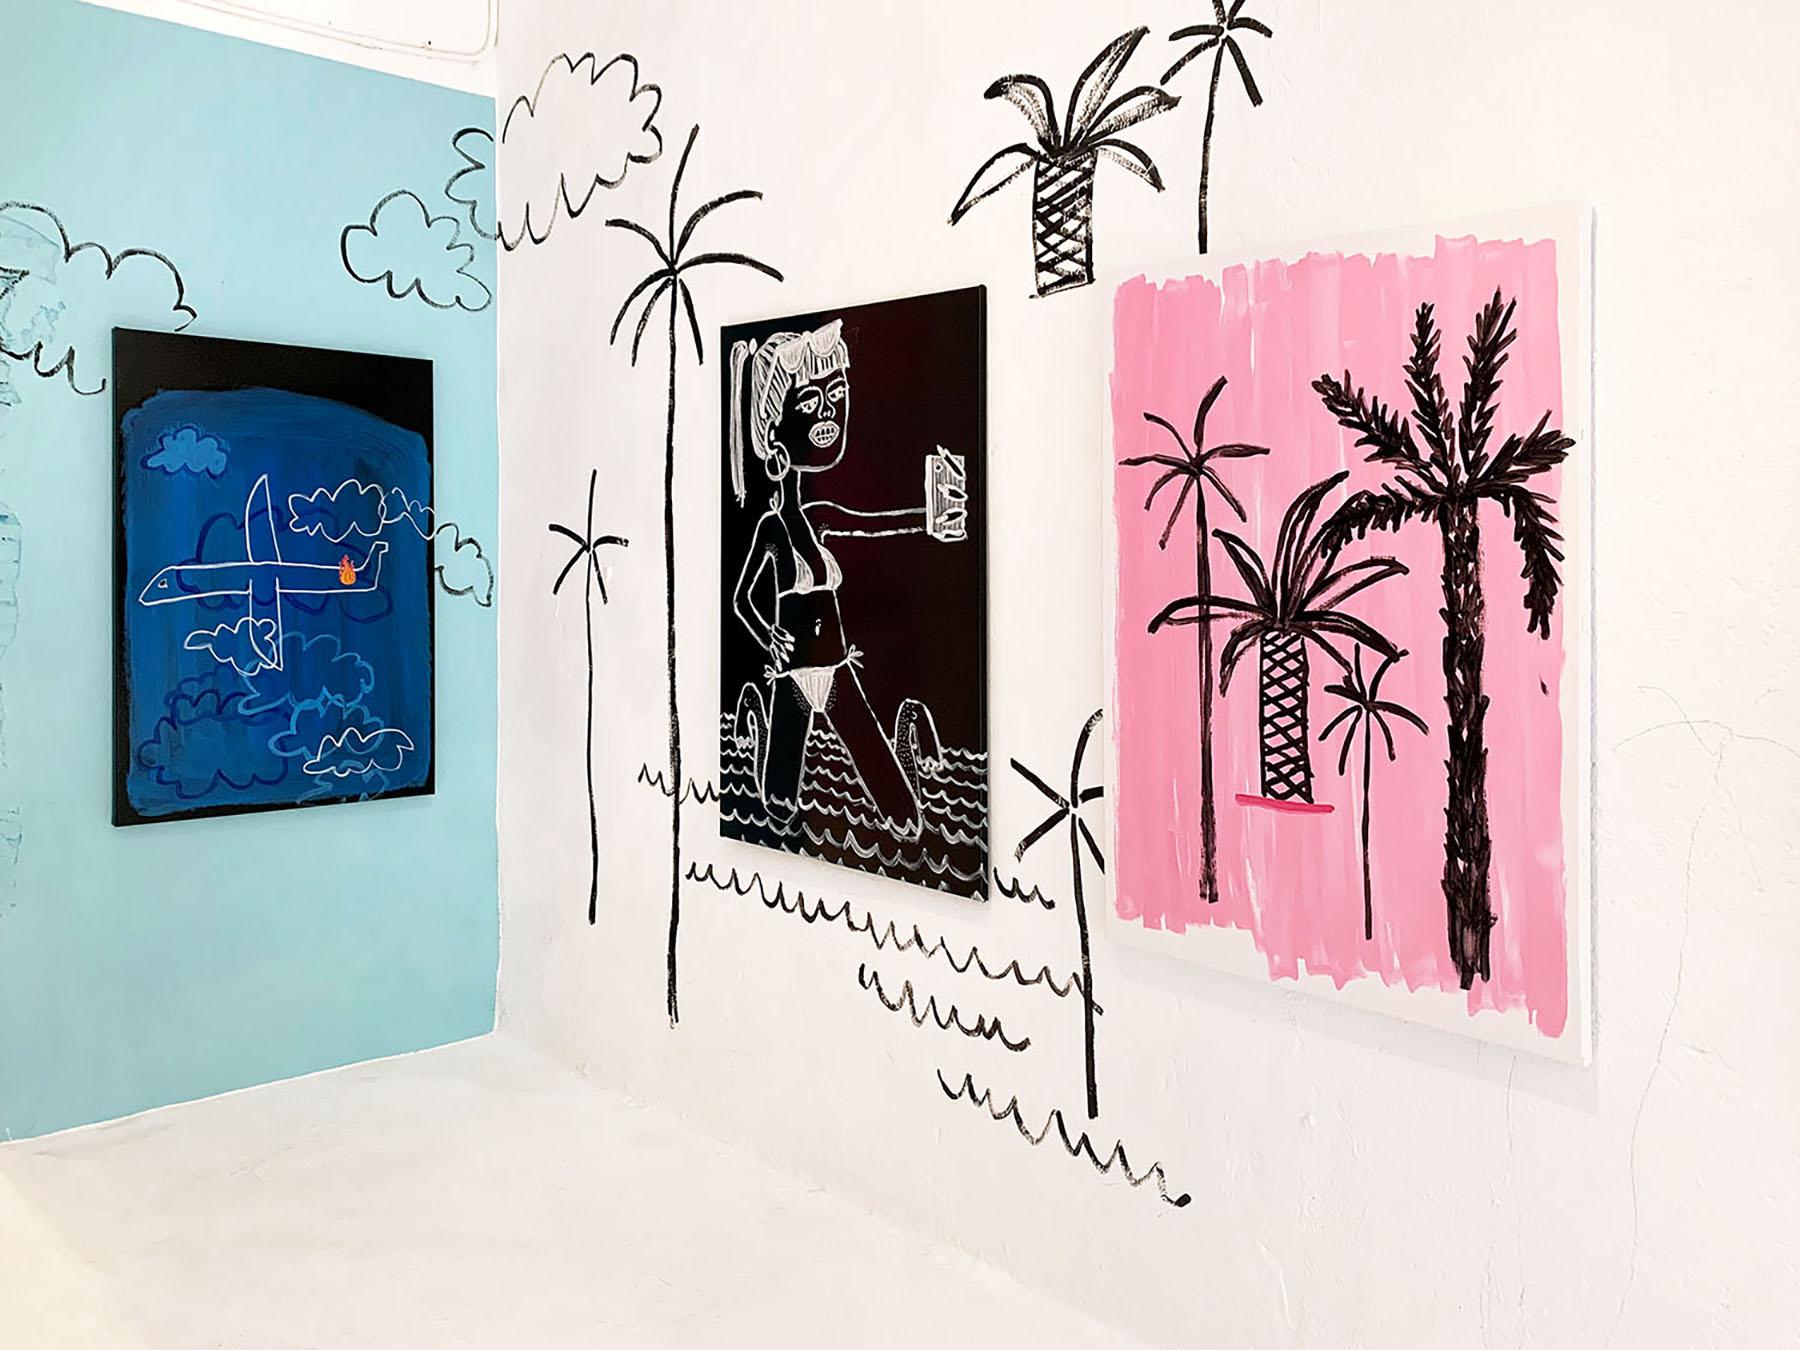 gallery weekend barcelona, uxval gochez gallery, katharina arndt, german female, emerging, painter, art to collect, available artworks, wall art, spotlight